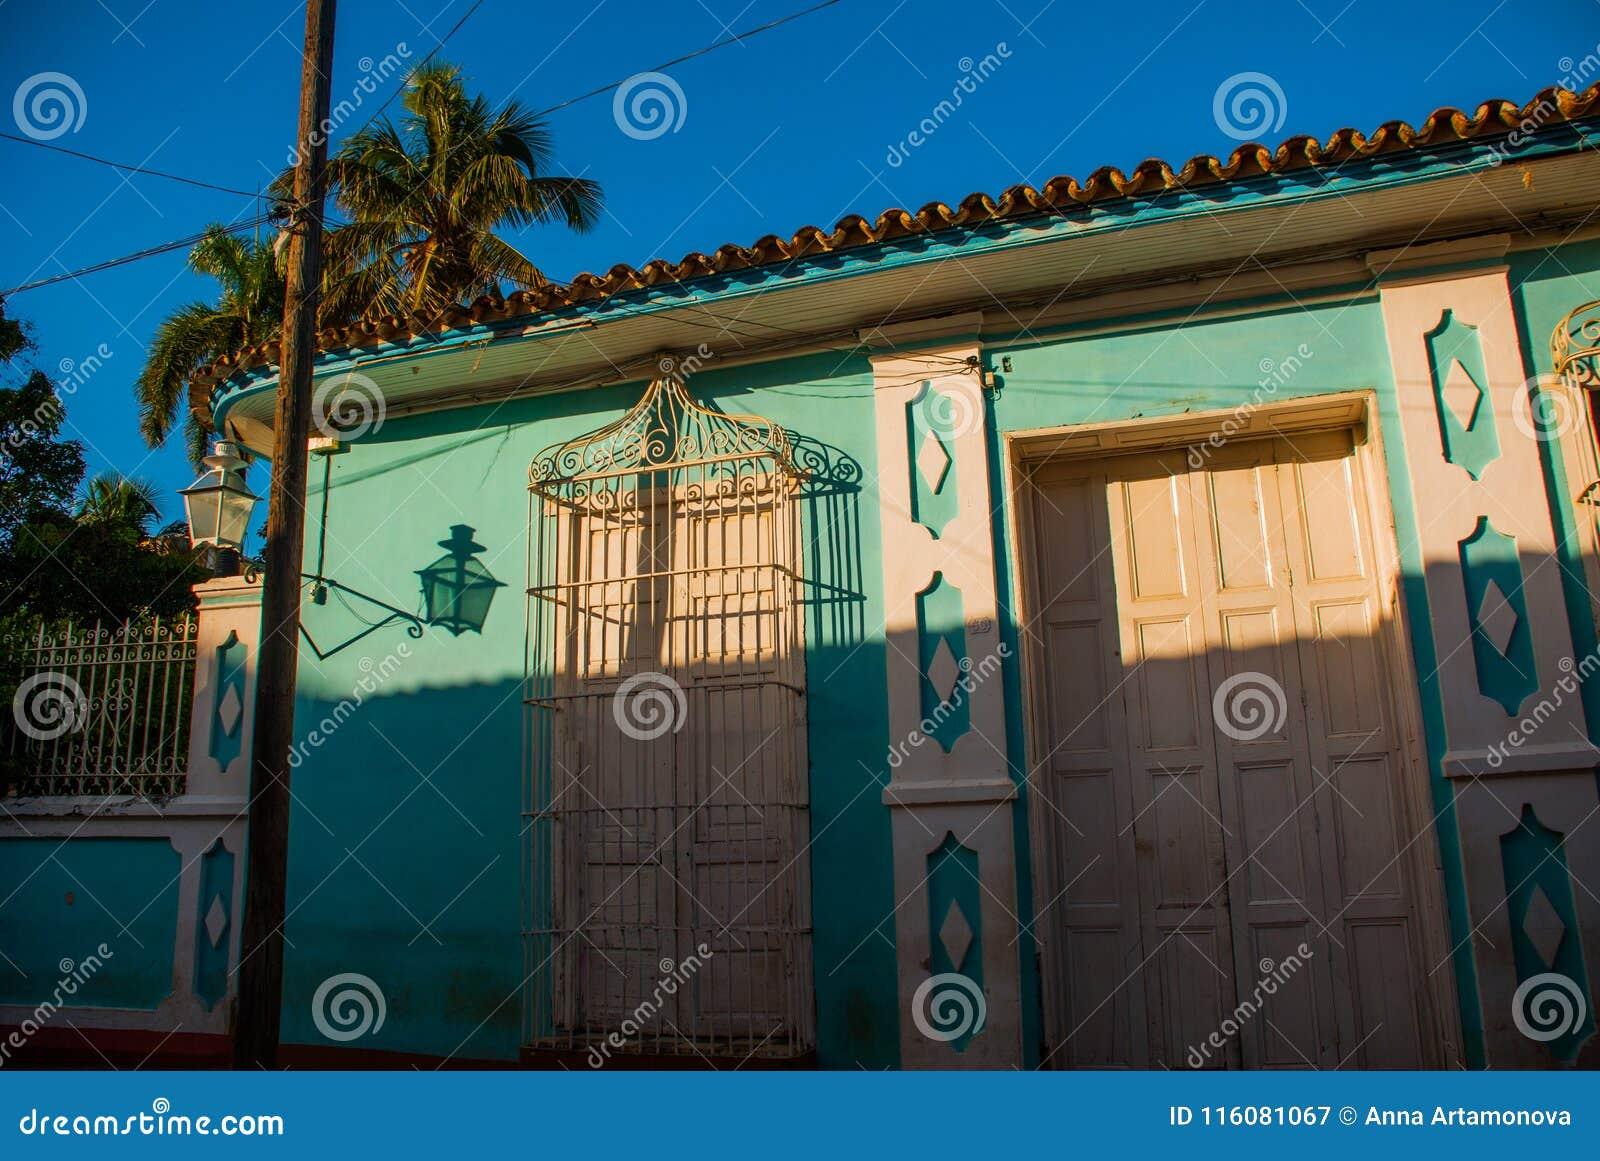 Santeria Ισραήλ, Τρινιδάδ, Κούβα Το santeria είναι η θρησκεία των afro-κουβανικών λαών στην Κούβα